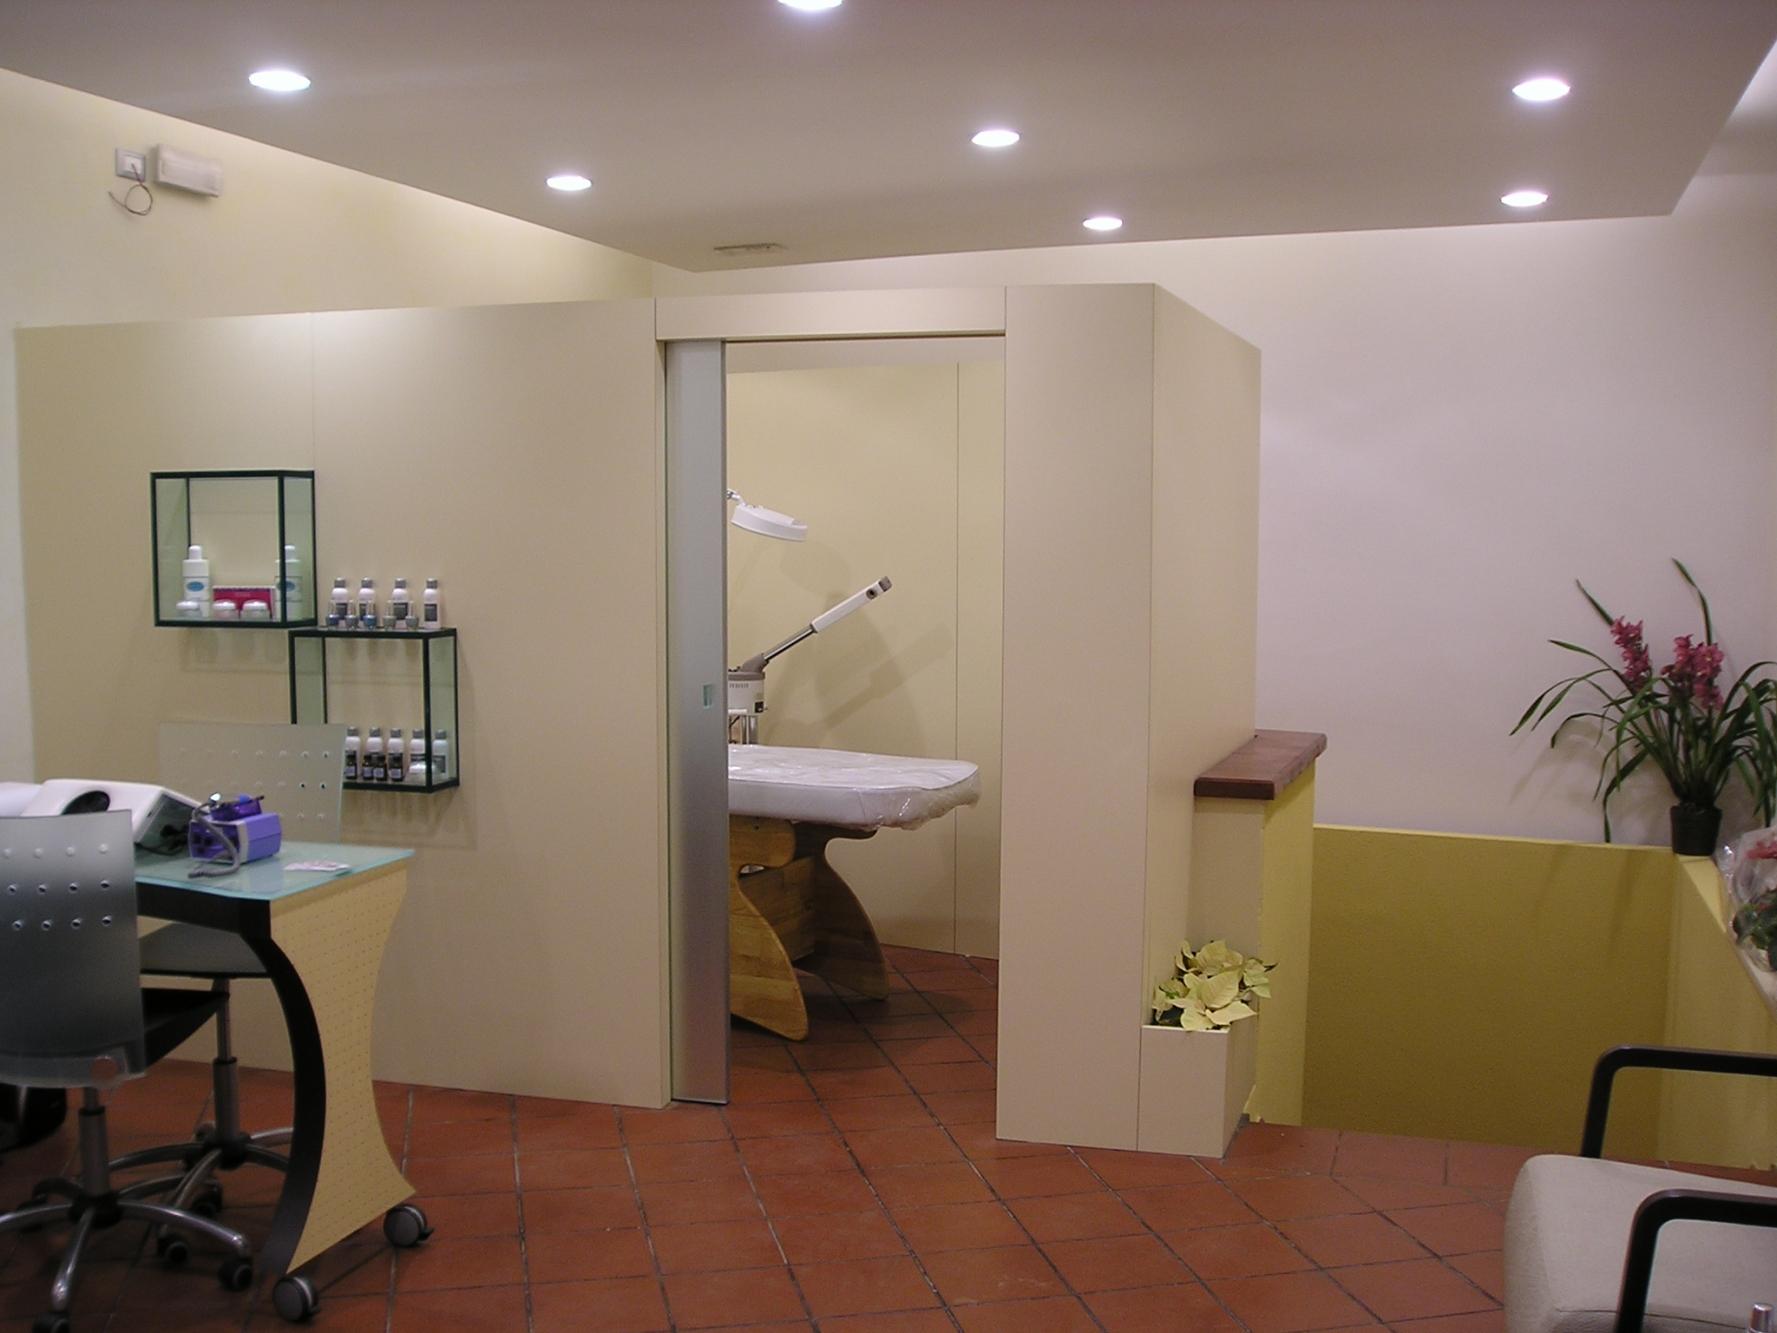 Arredamento centro di estetica elegance nail a bologna mania for Arredamento estetica